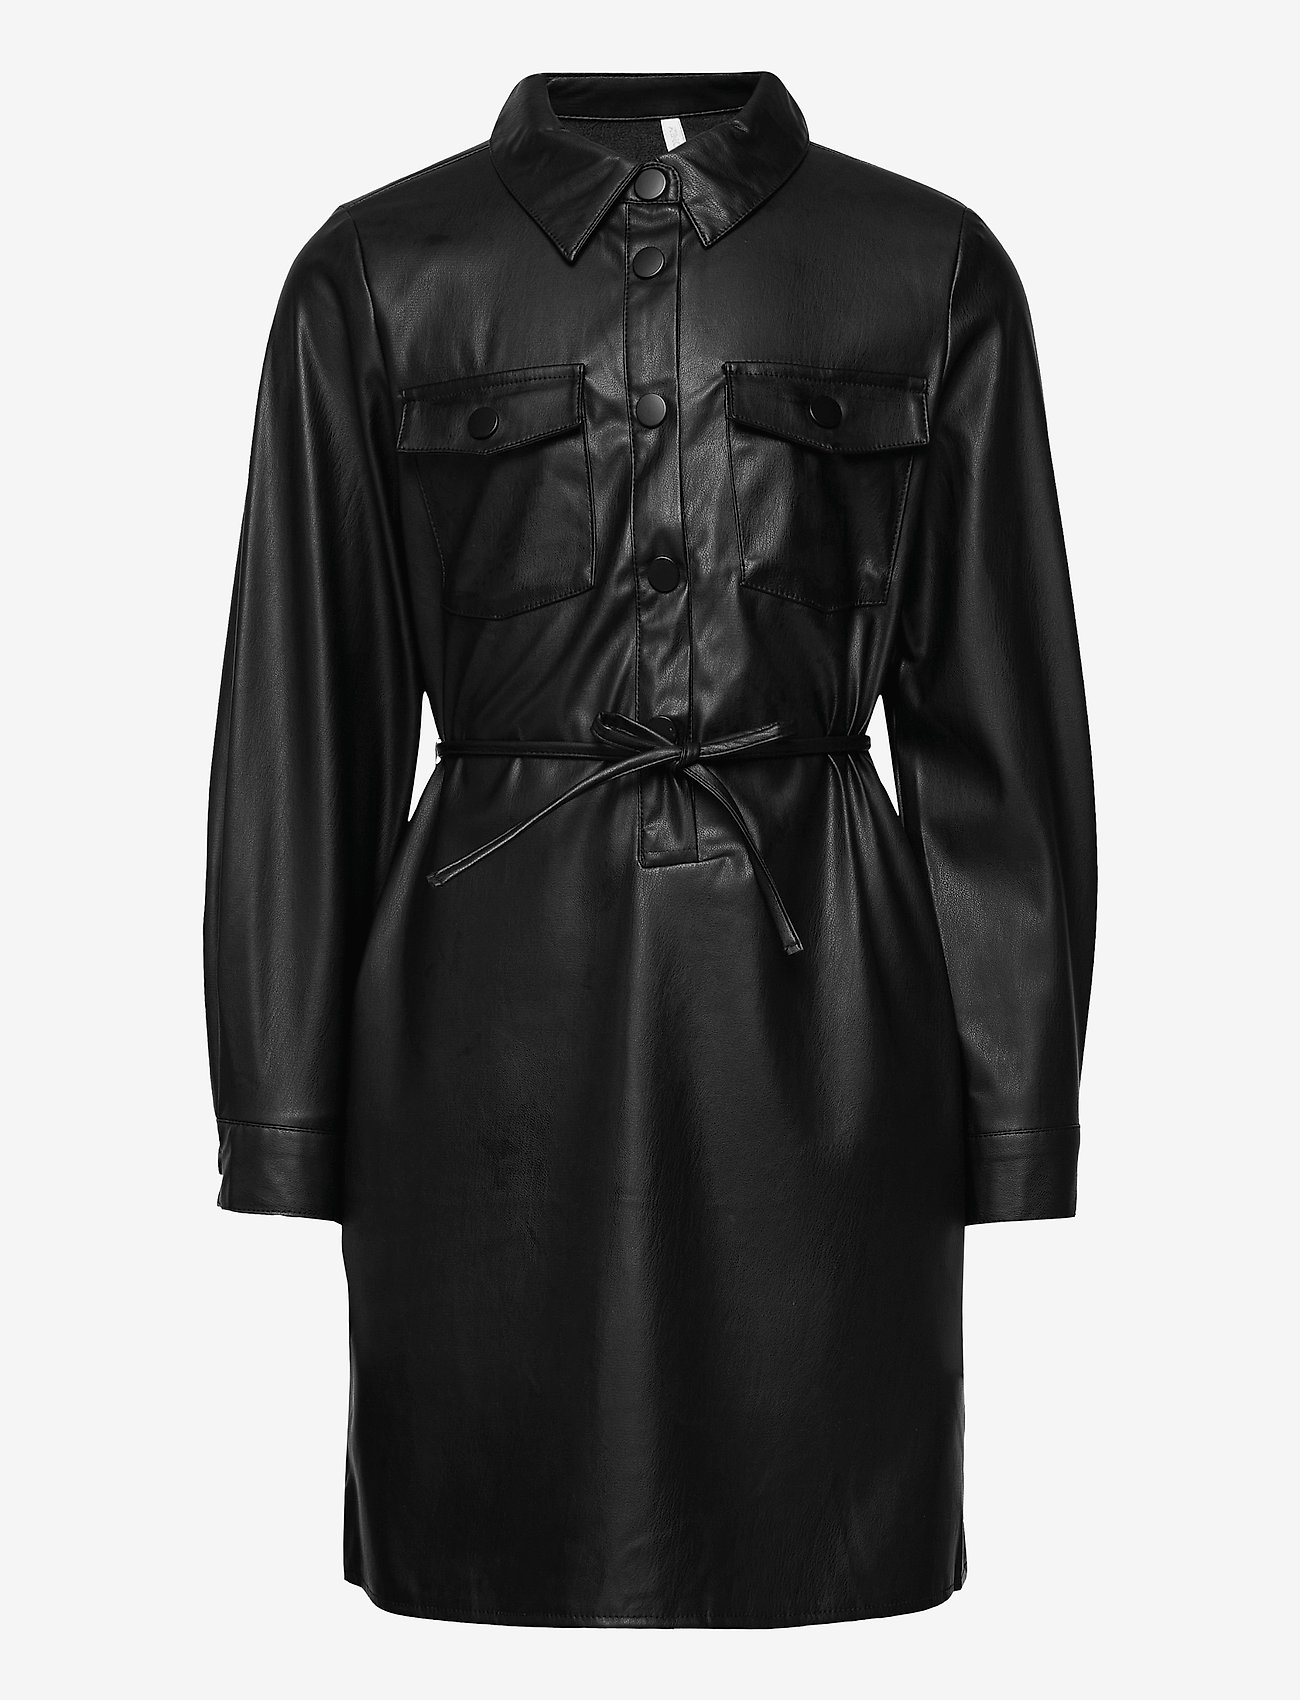 Kids Only - KONBIRDIE PU BELT DRESS PNT - black - 0